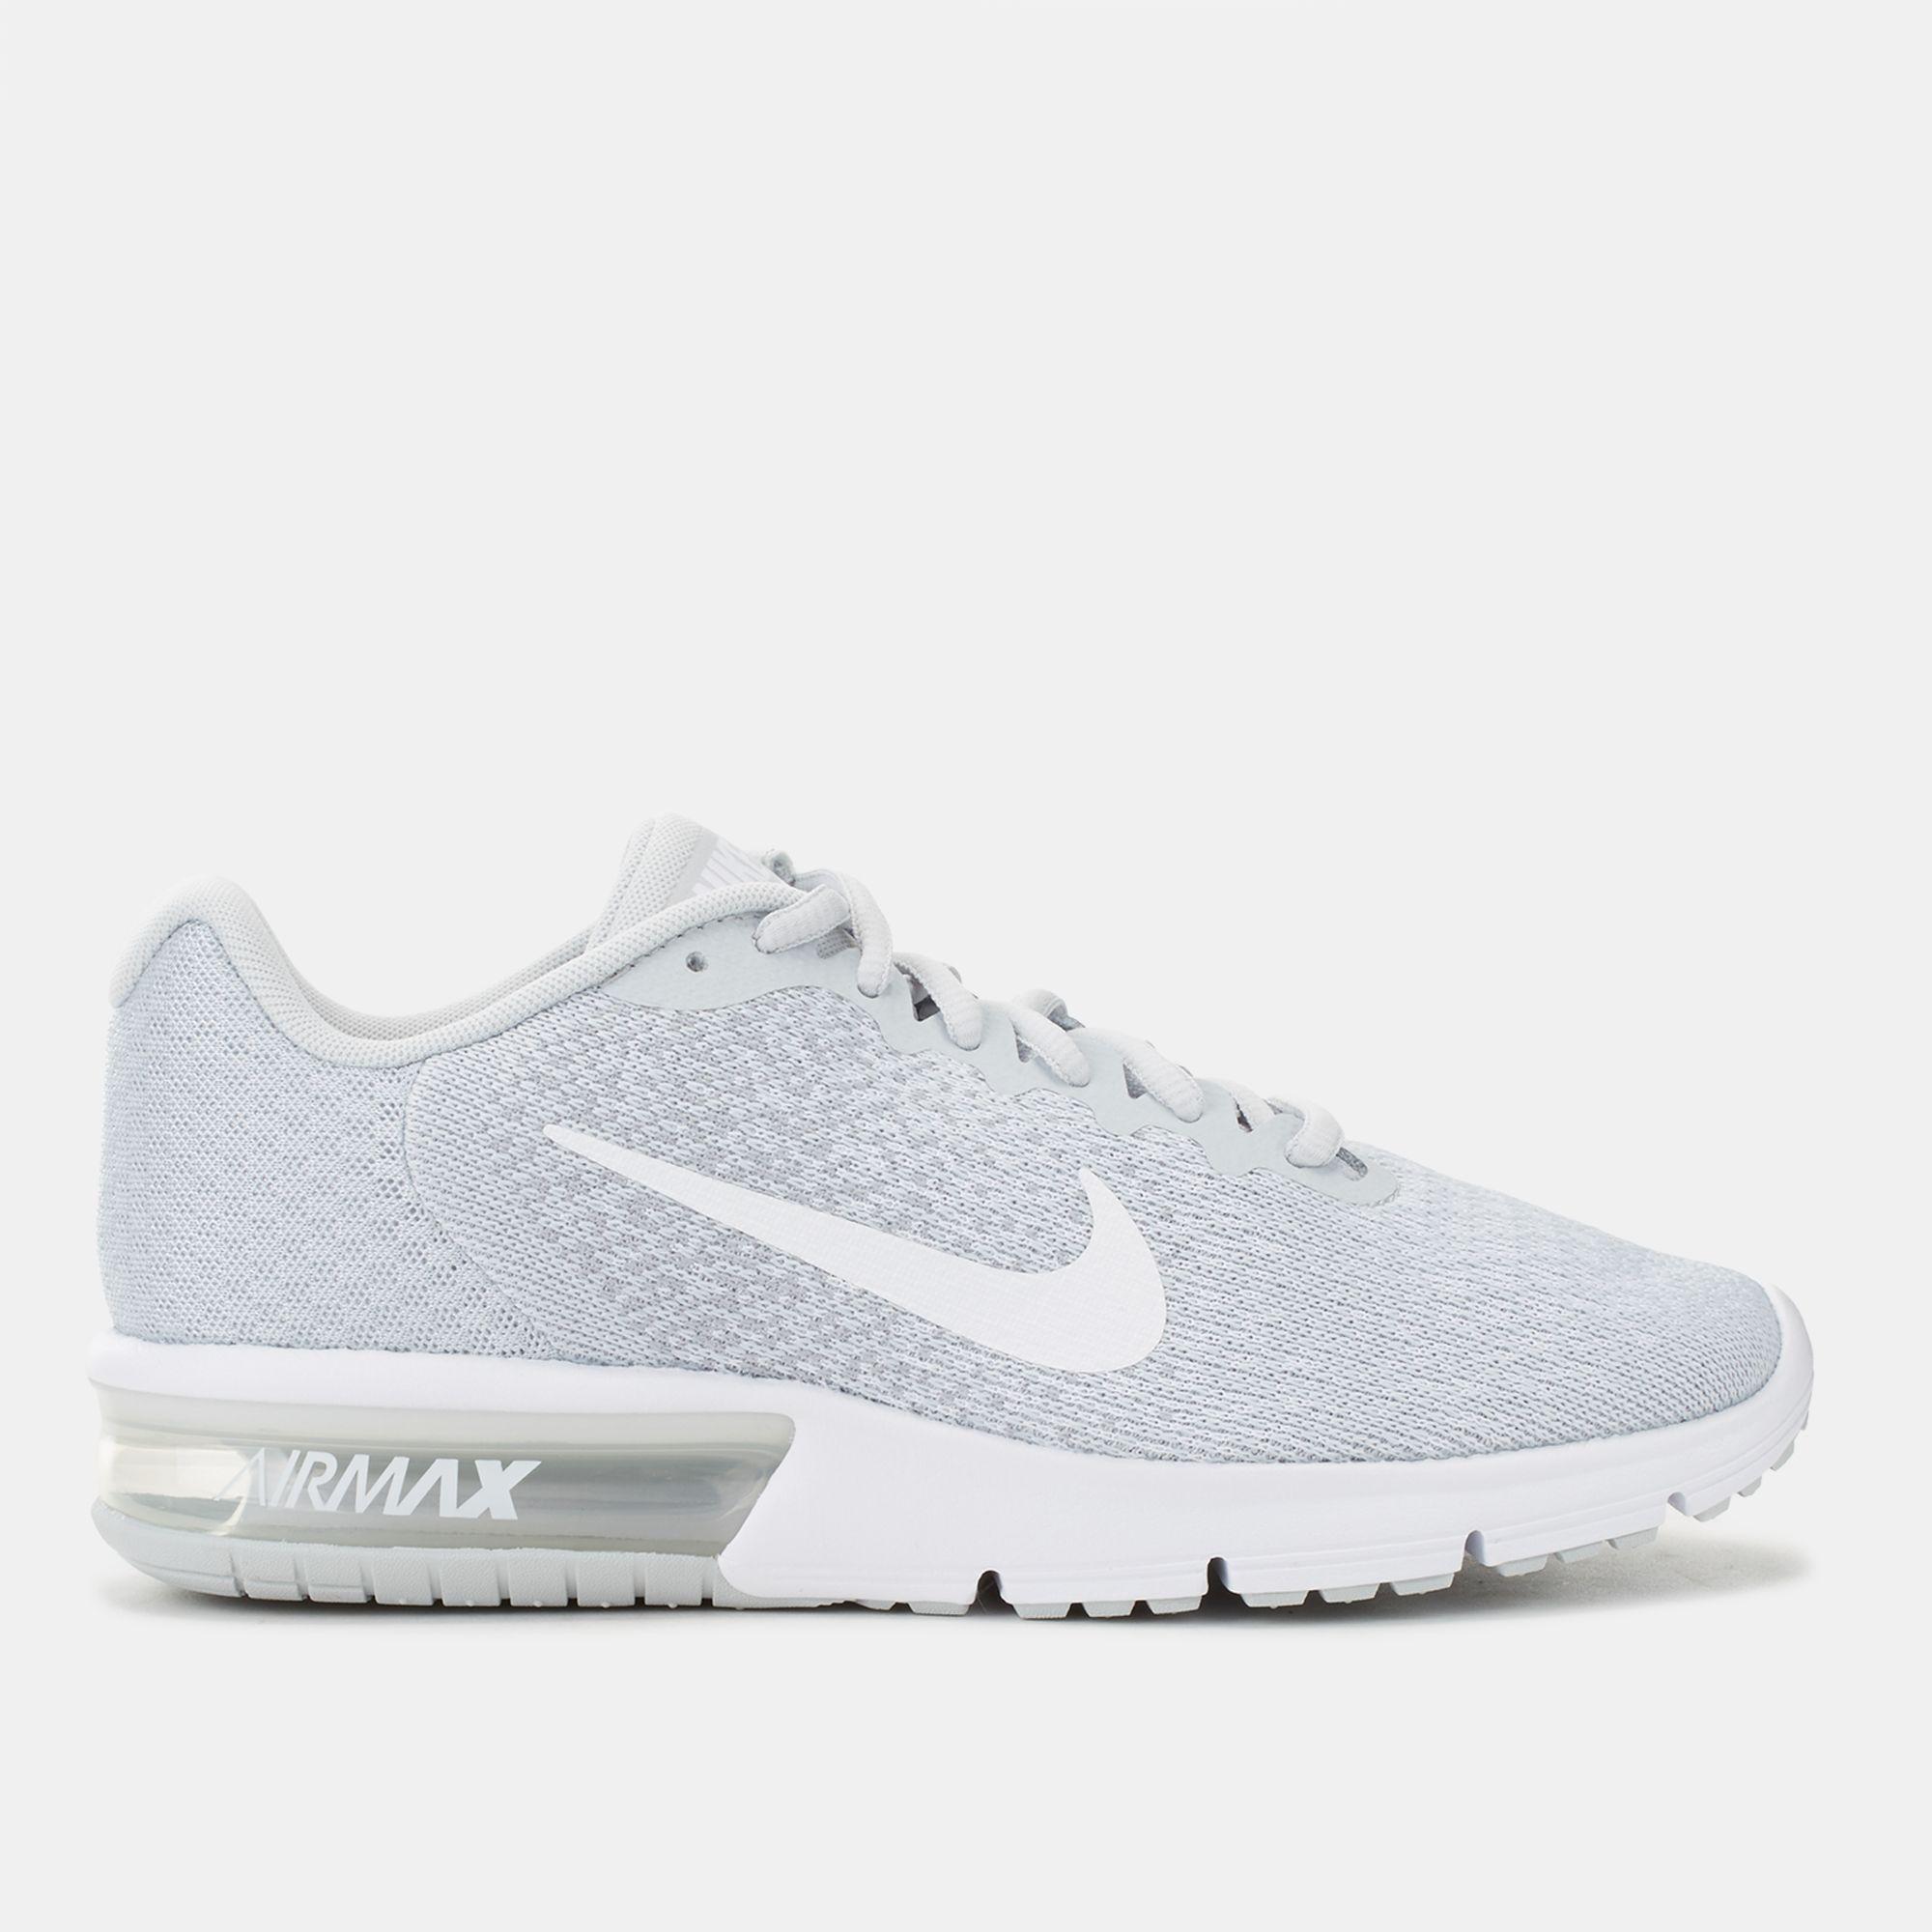 234b5f0436e ... black dark grey wolf grey white womens running shoelooseendsjewelry  e521e 95b84  promo code for nike air max sequent 2 shoe grey 9442e 804d7